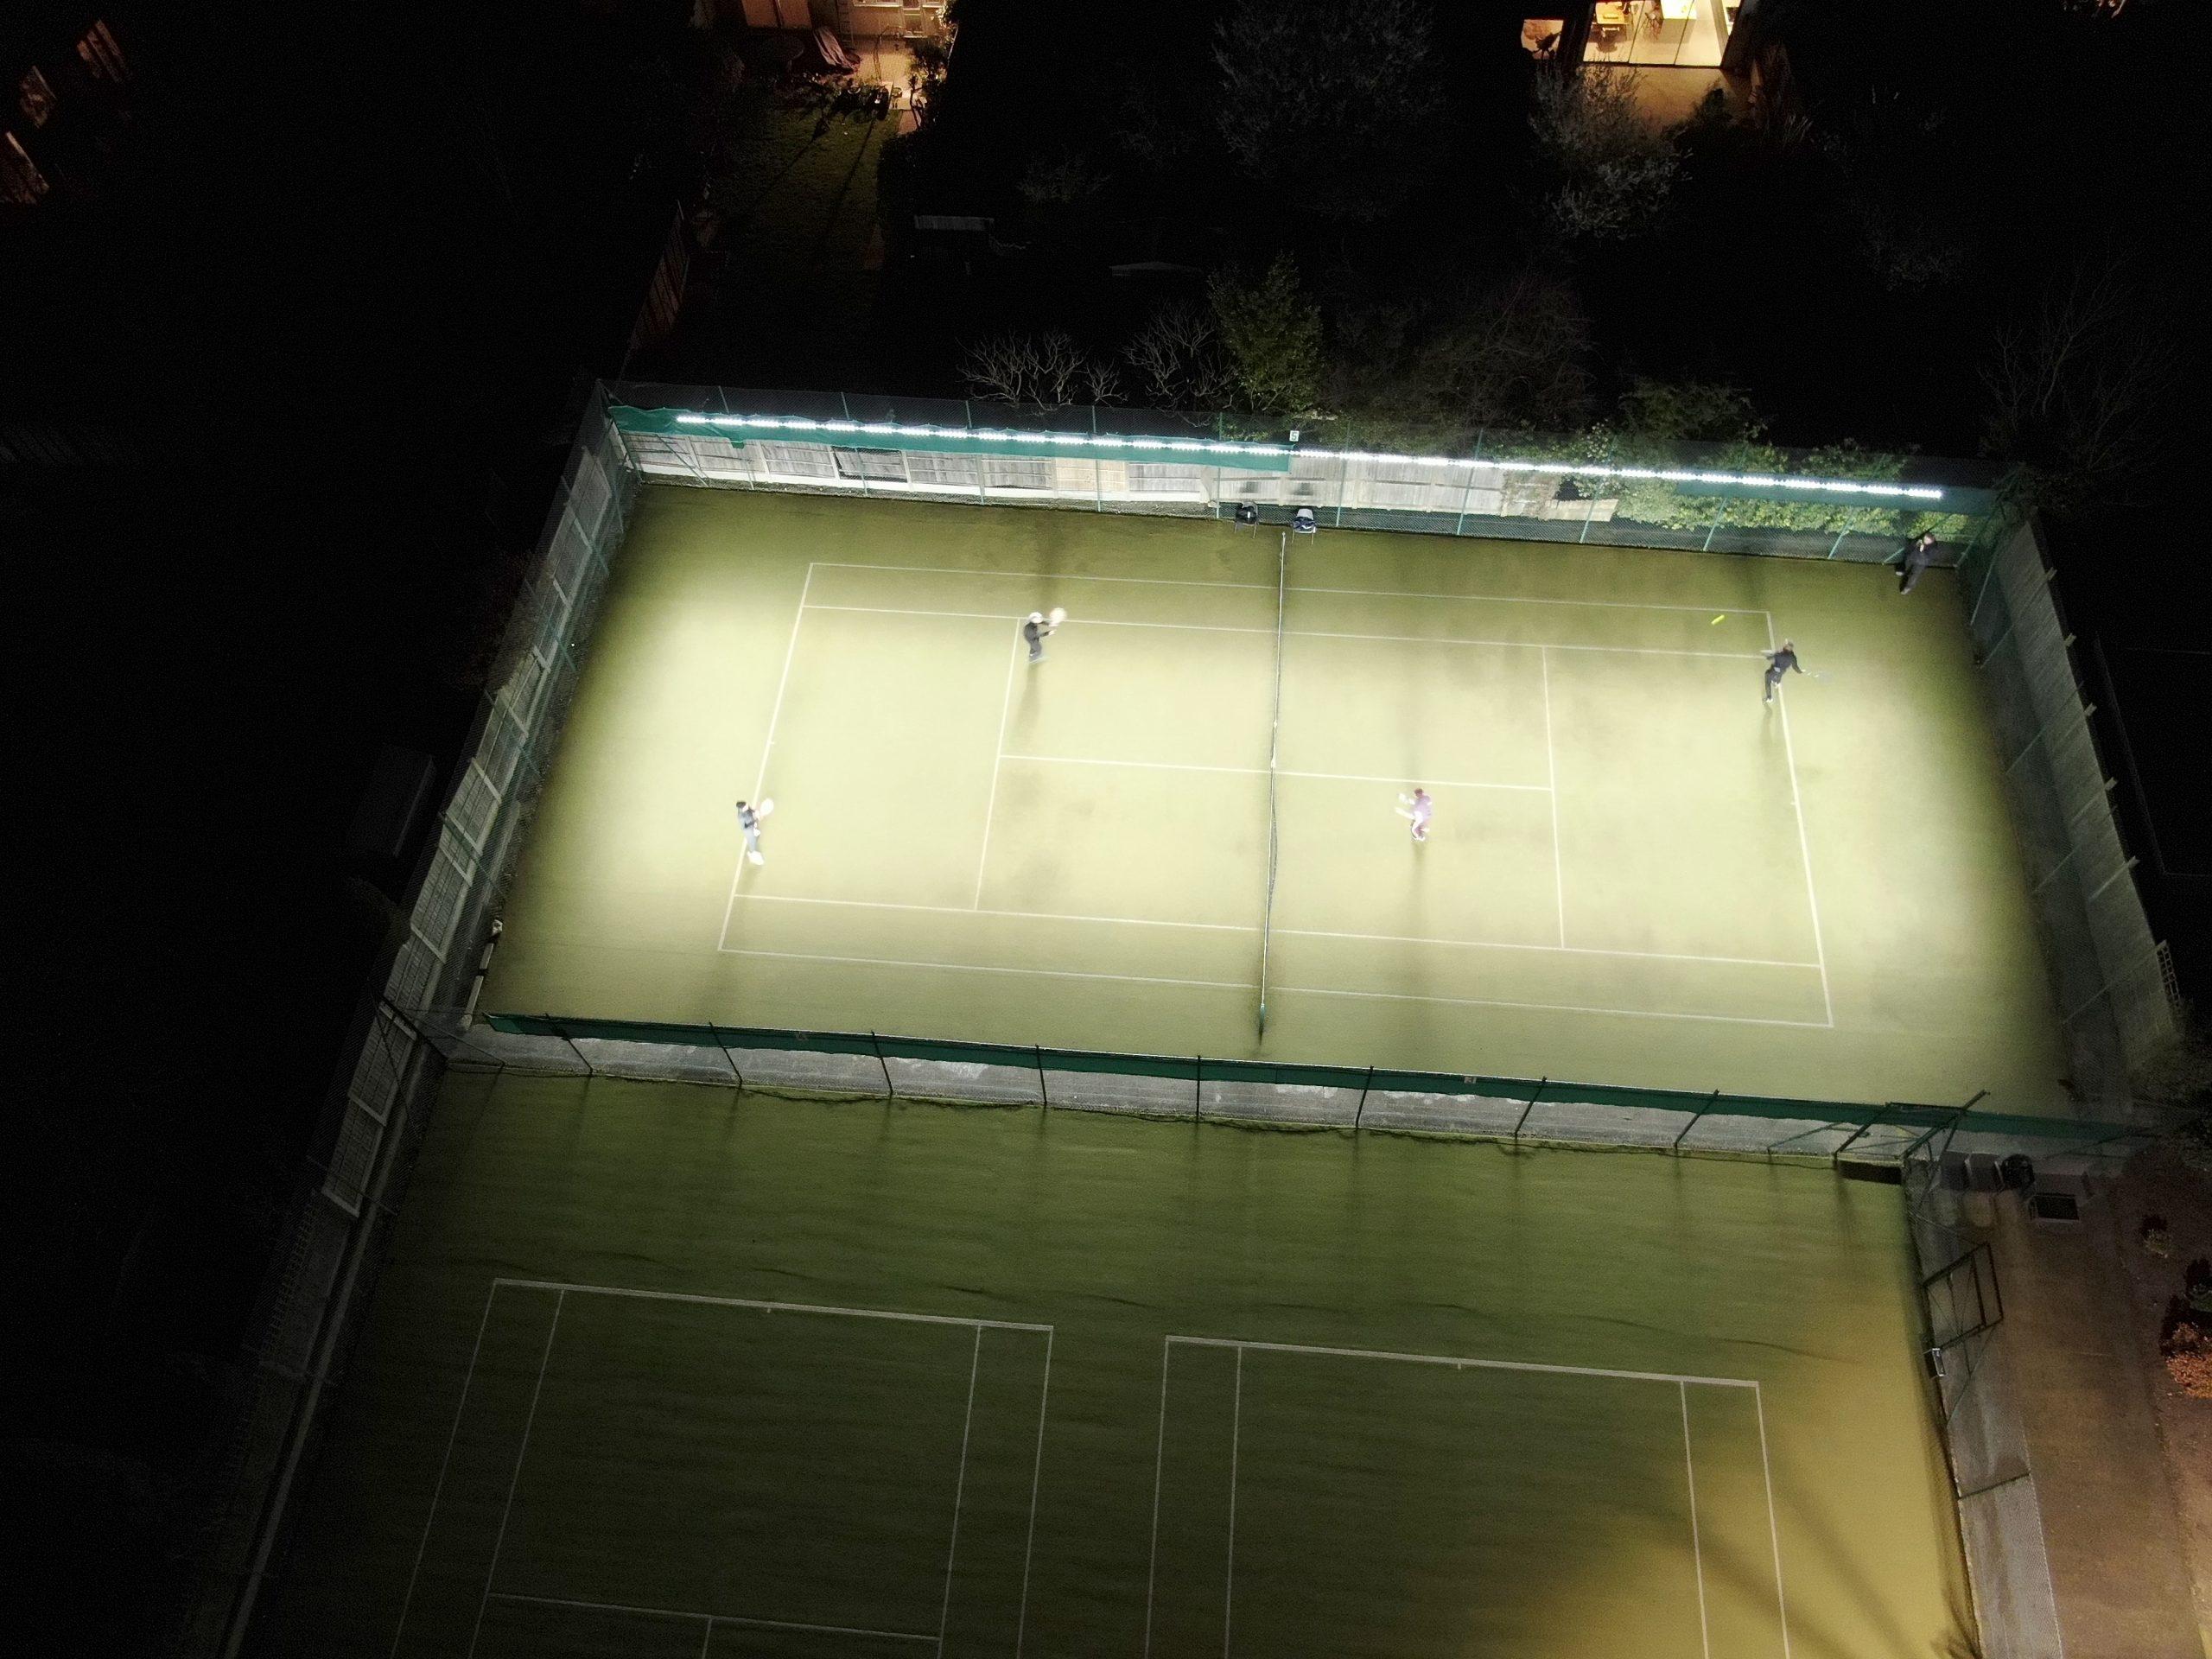 Our Lady of Muswell Tennis Club, United Kingdom